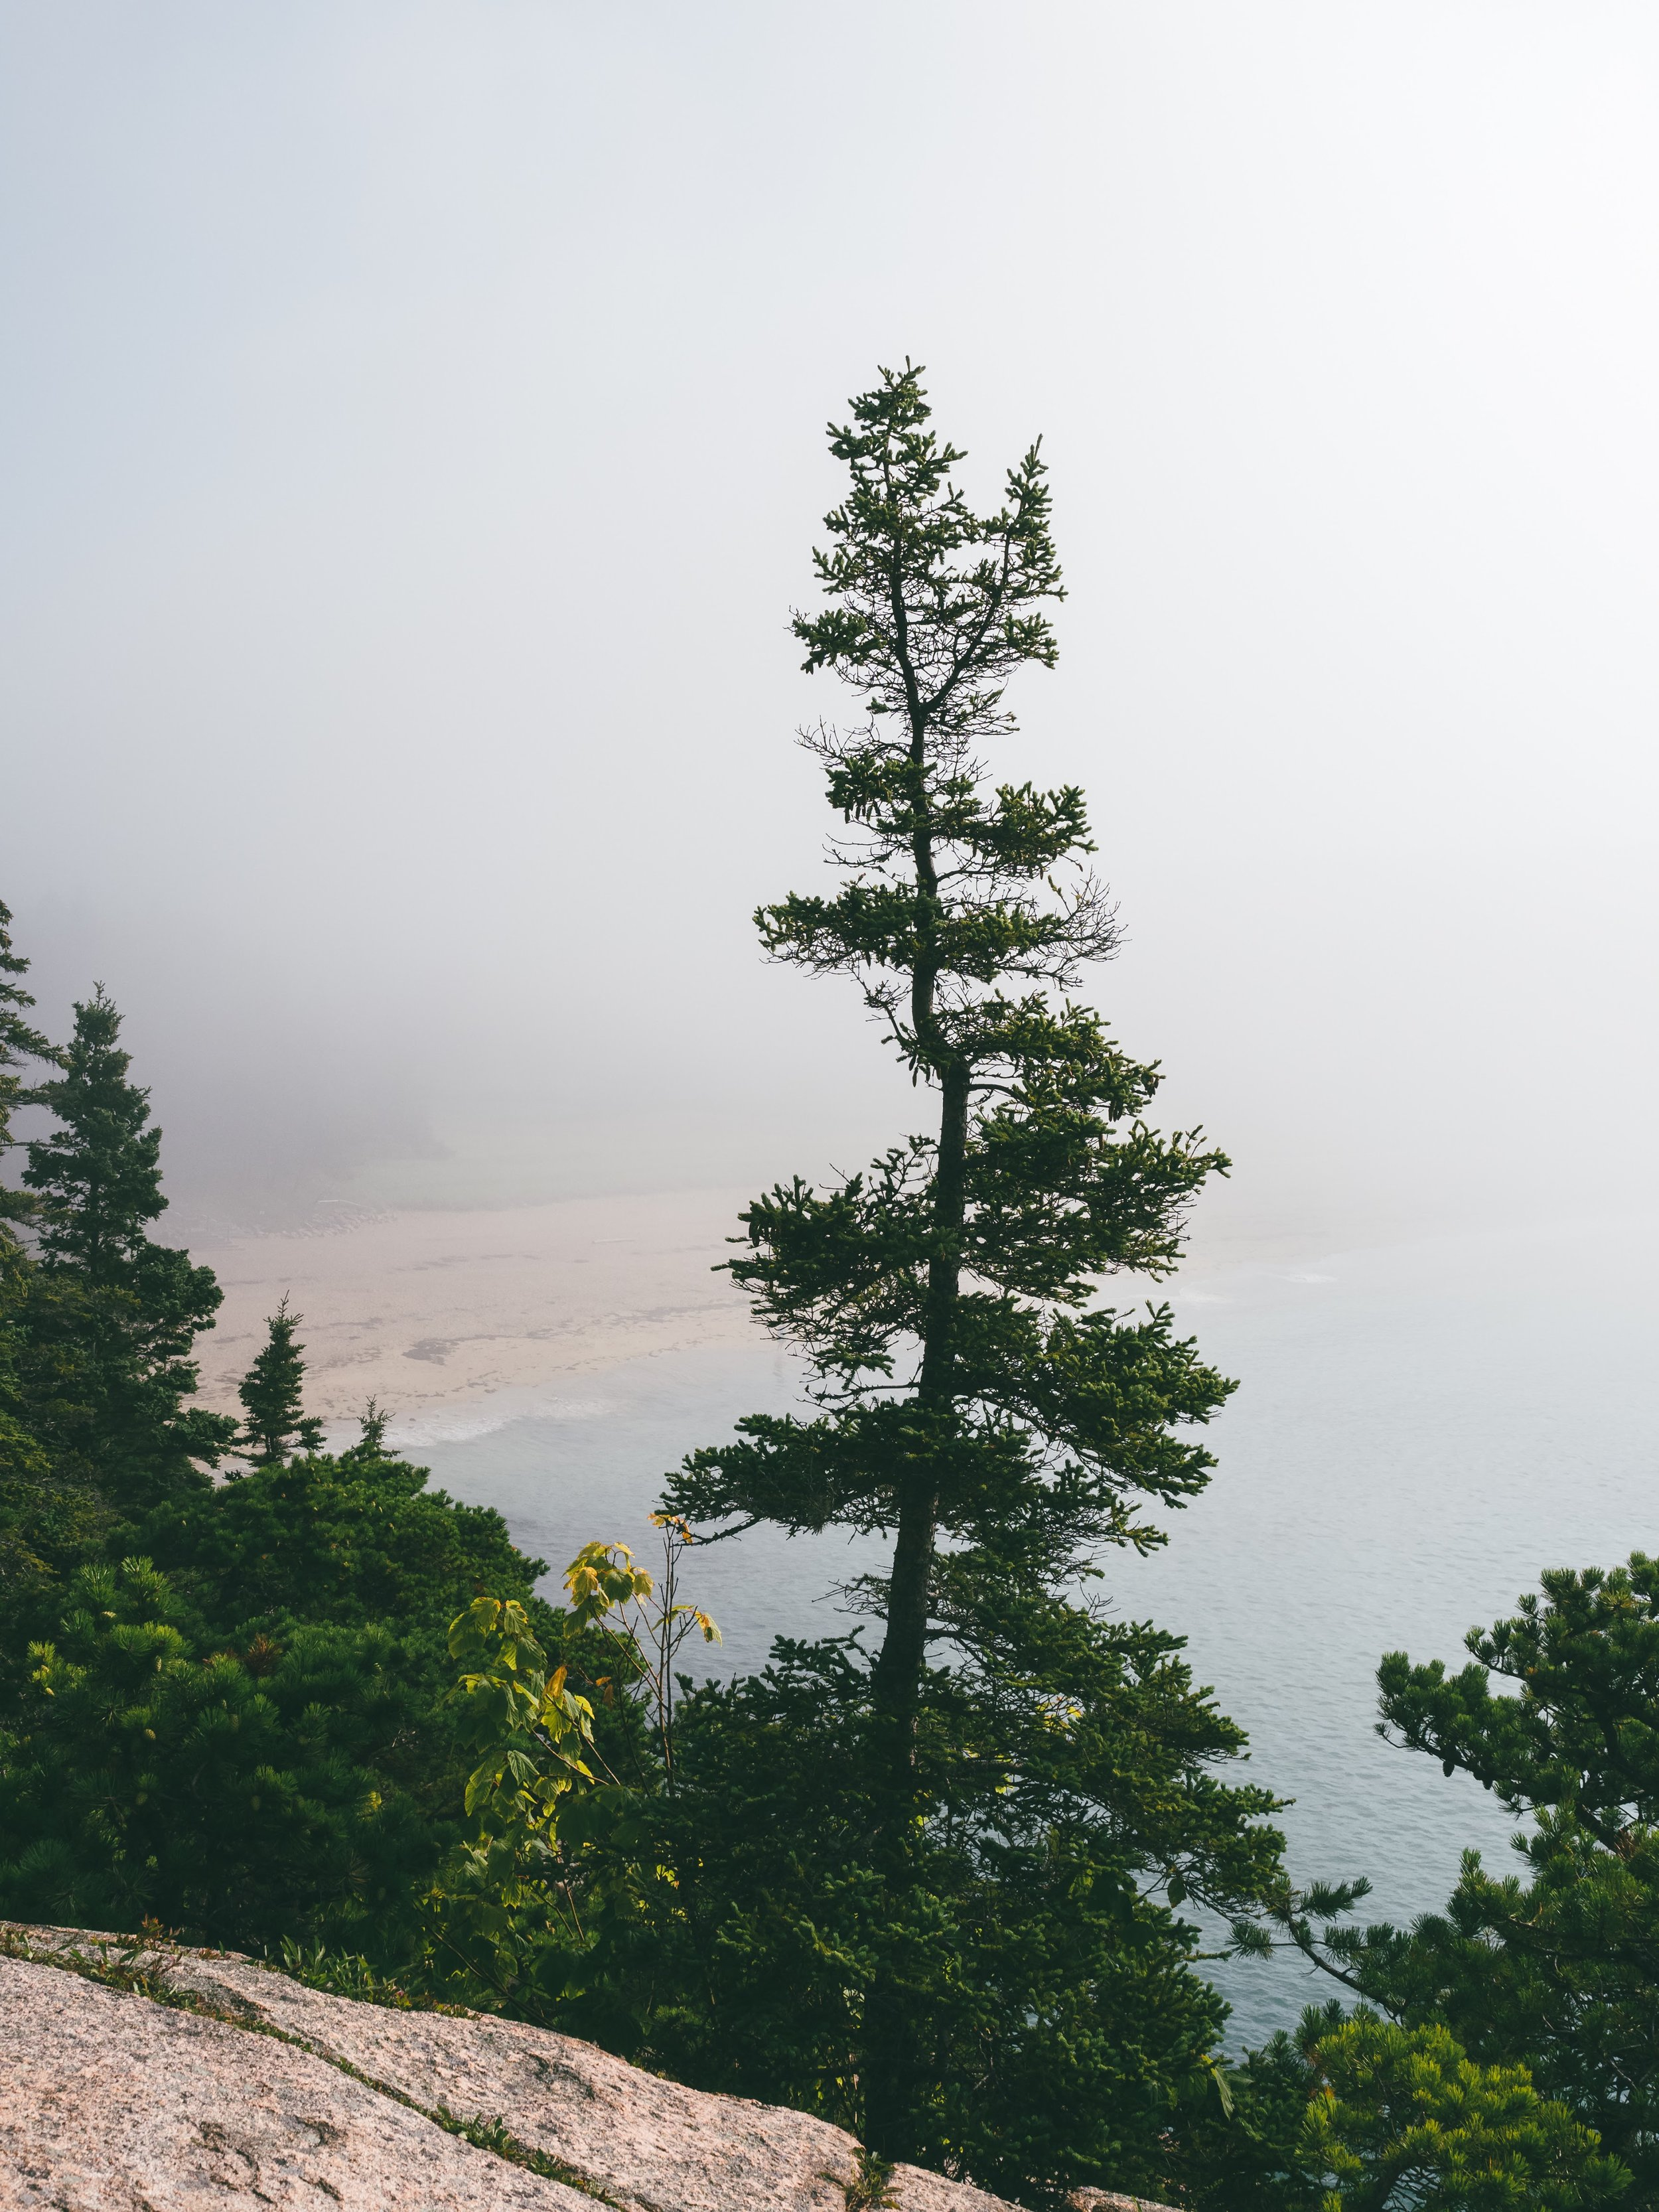 Sand Beach through the fog.